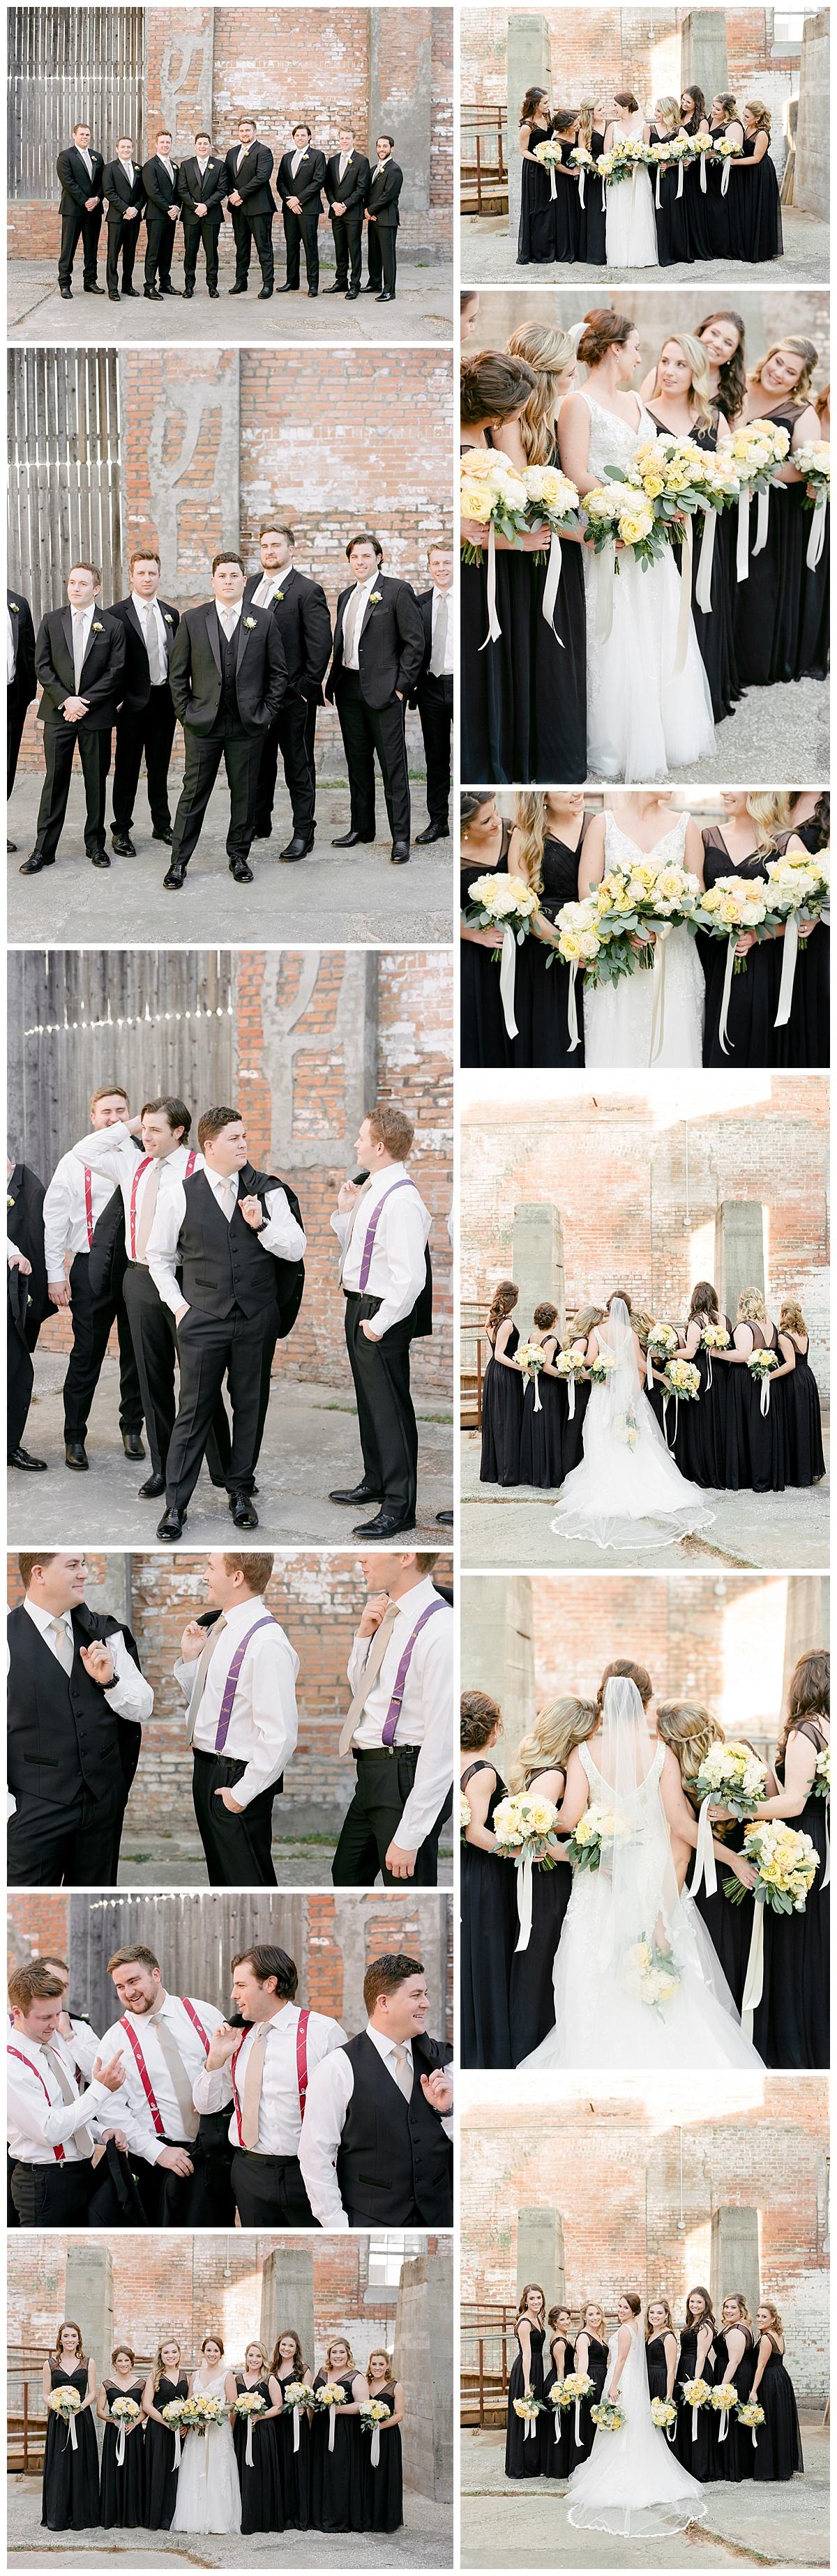 the-cotton-mill-wedding-ar-photography-10.jpg